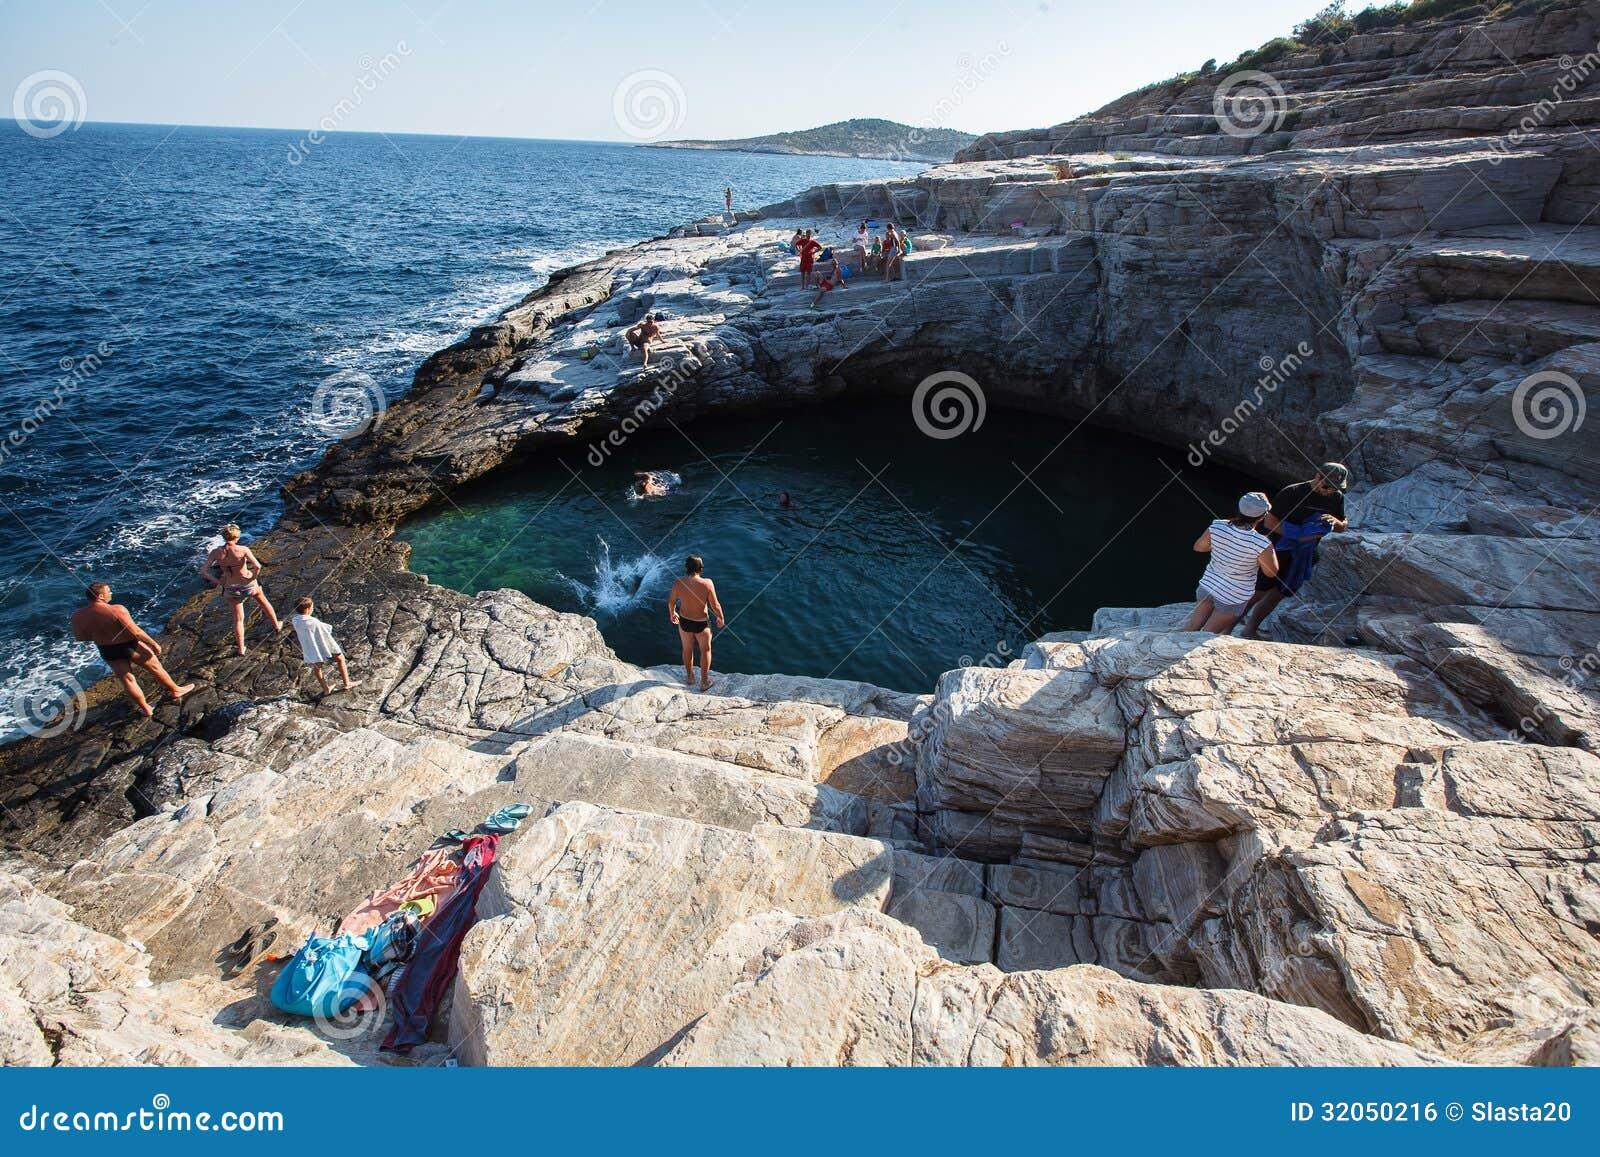 Giola, Thassos, Natural basin .Northern Greece June 26th